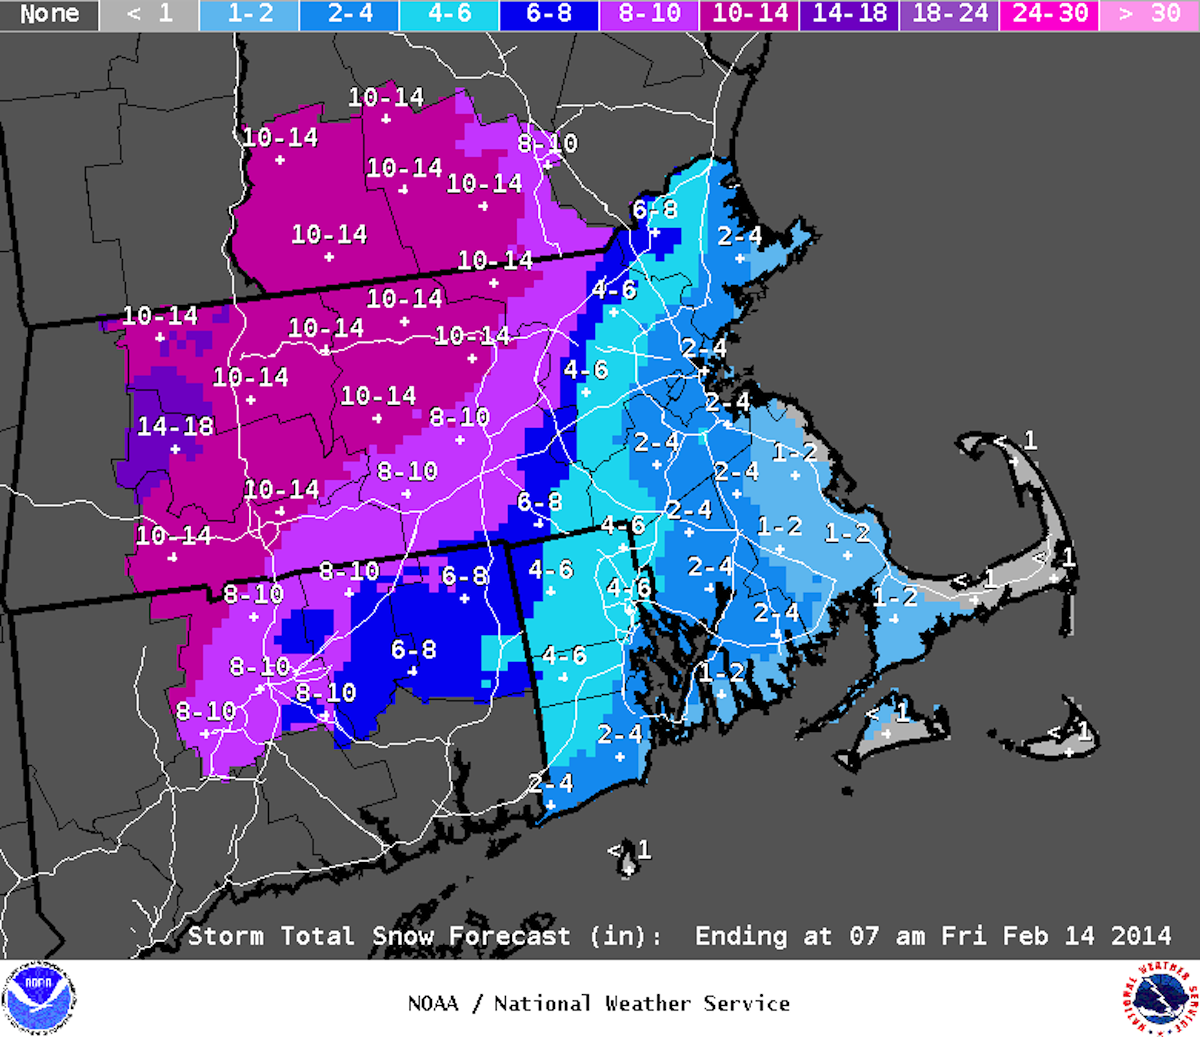 Image via National Weather Service